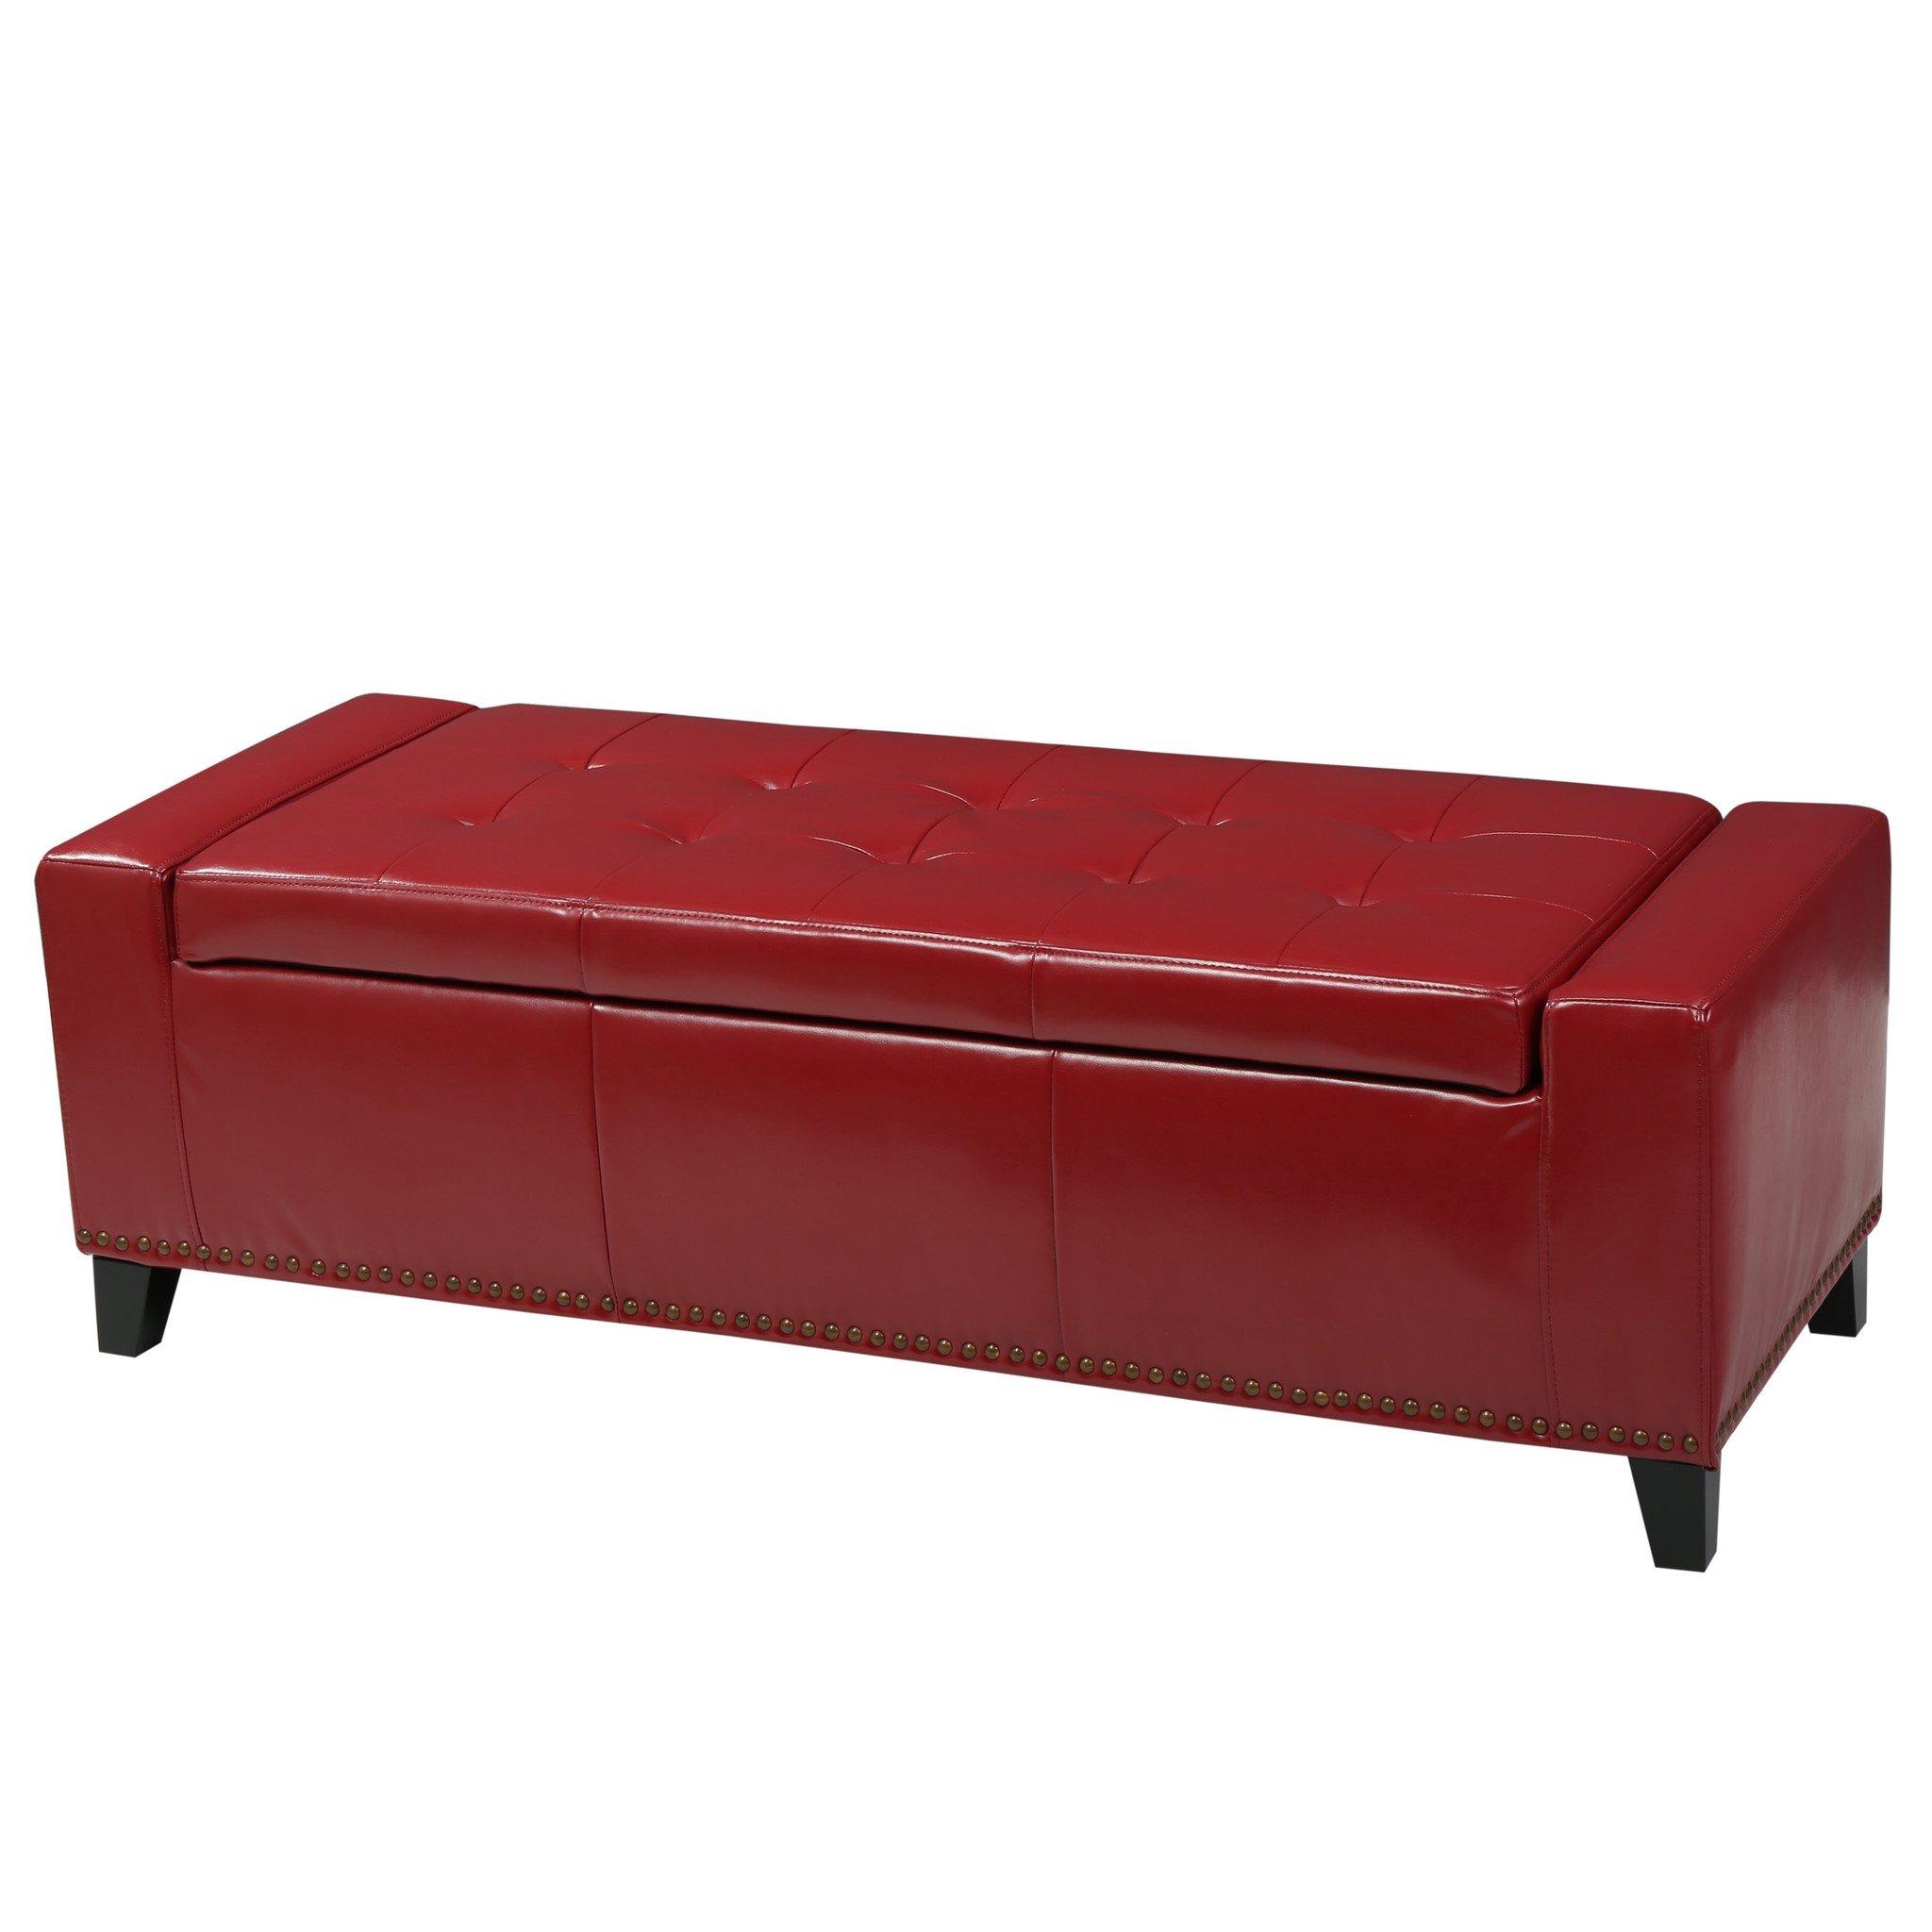 robin studded red leather storage ottoman bench storage ottoman